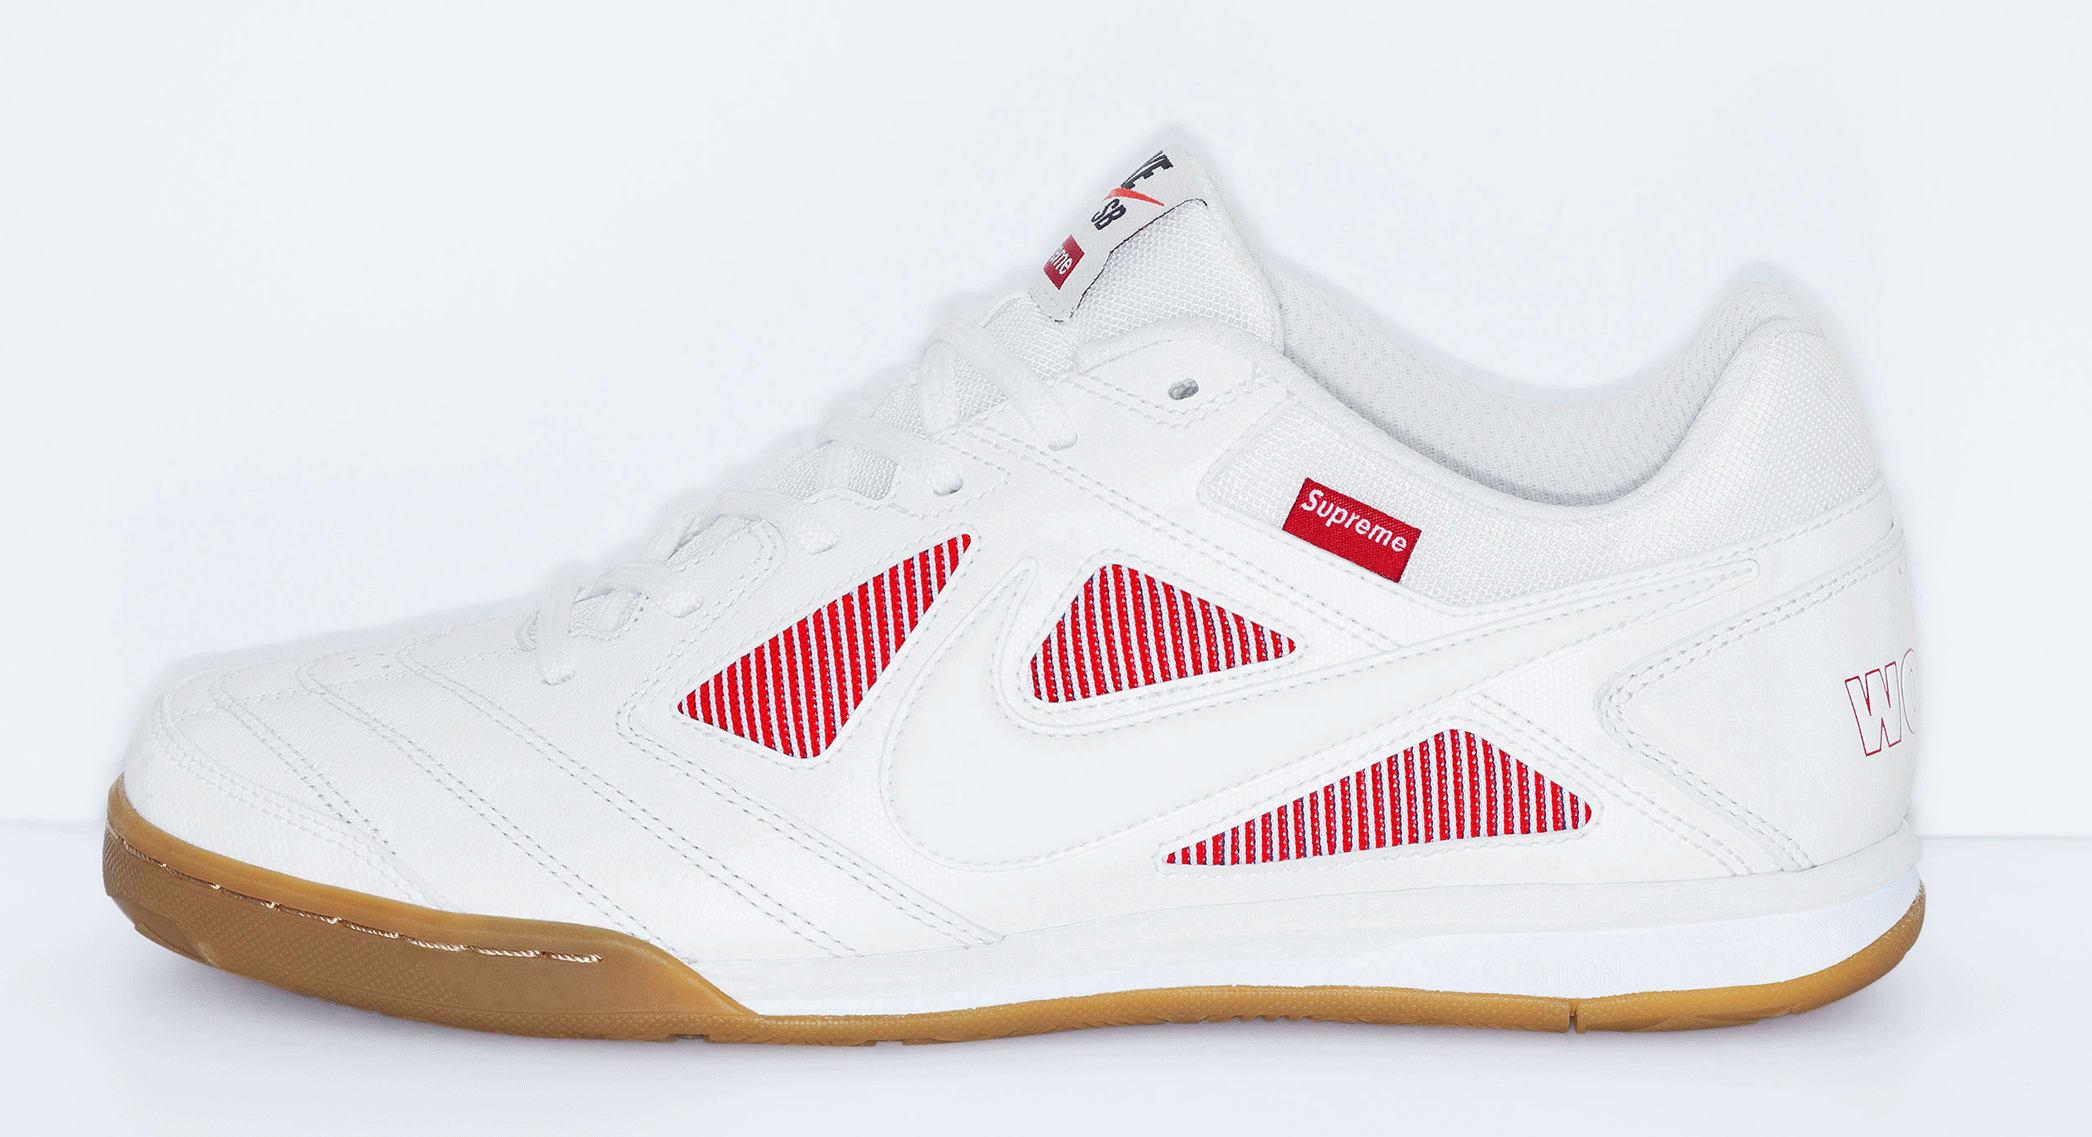 Gato Collector Nike5 Sb Release X Indoor DateSole Lunar Supreme 4RSc5Ajq3L